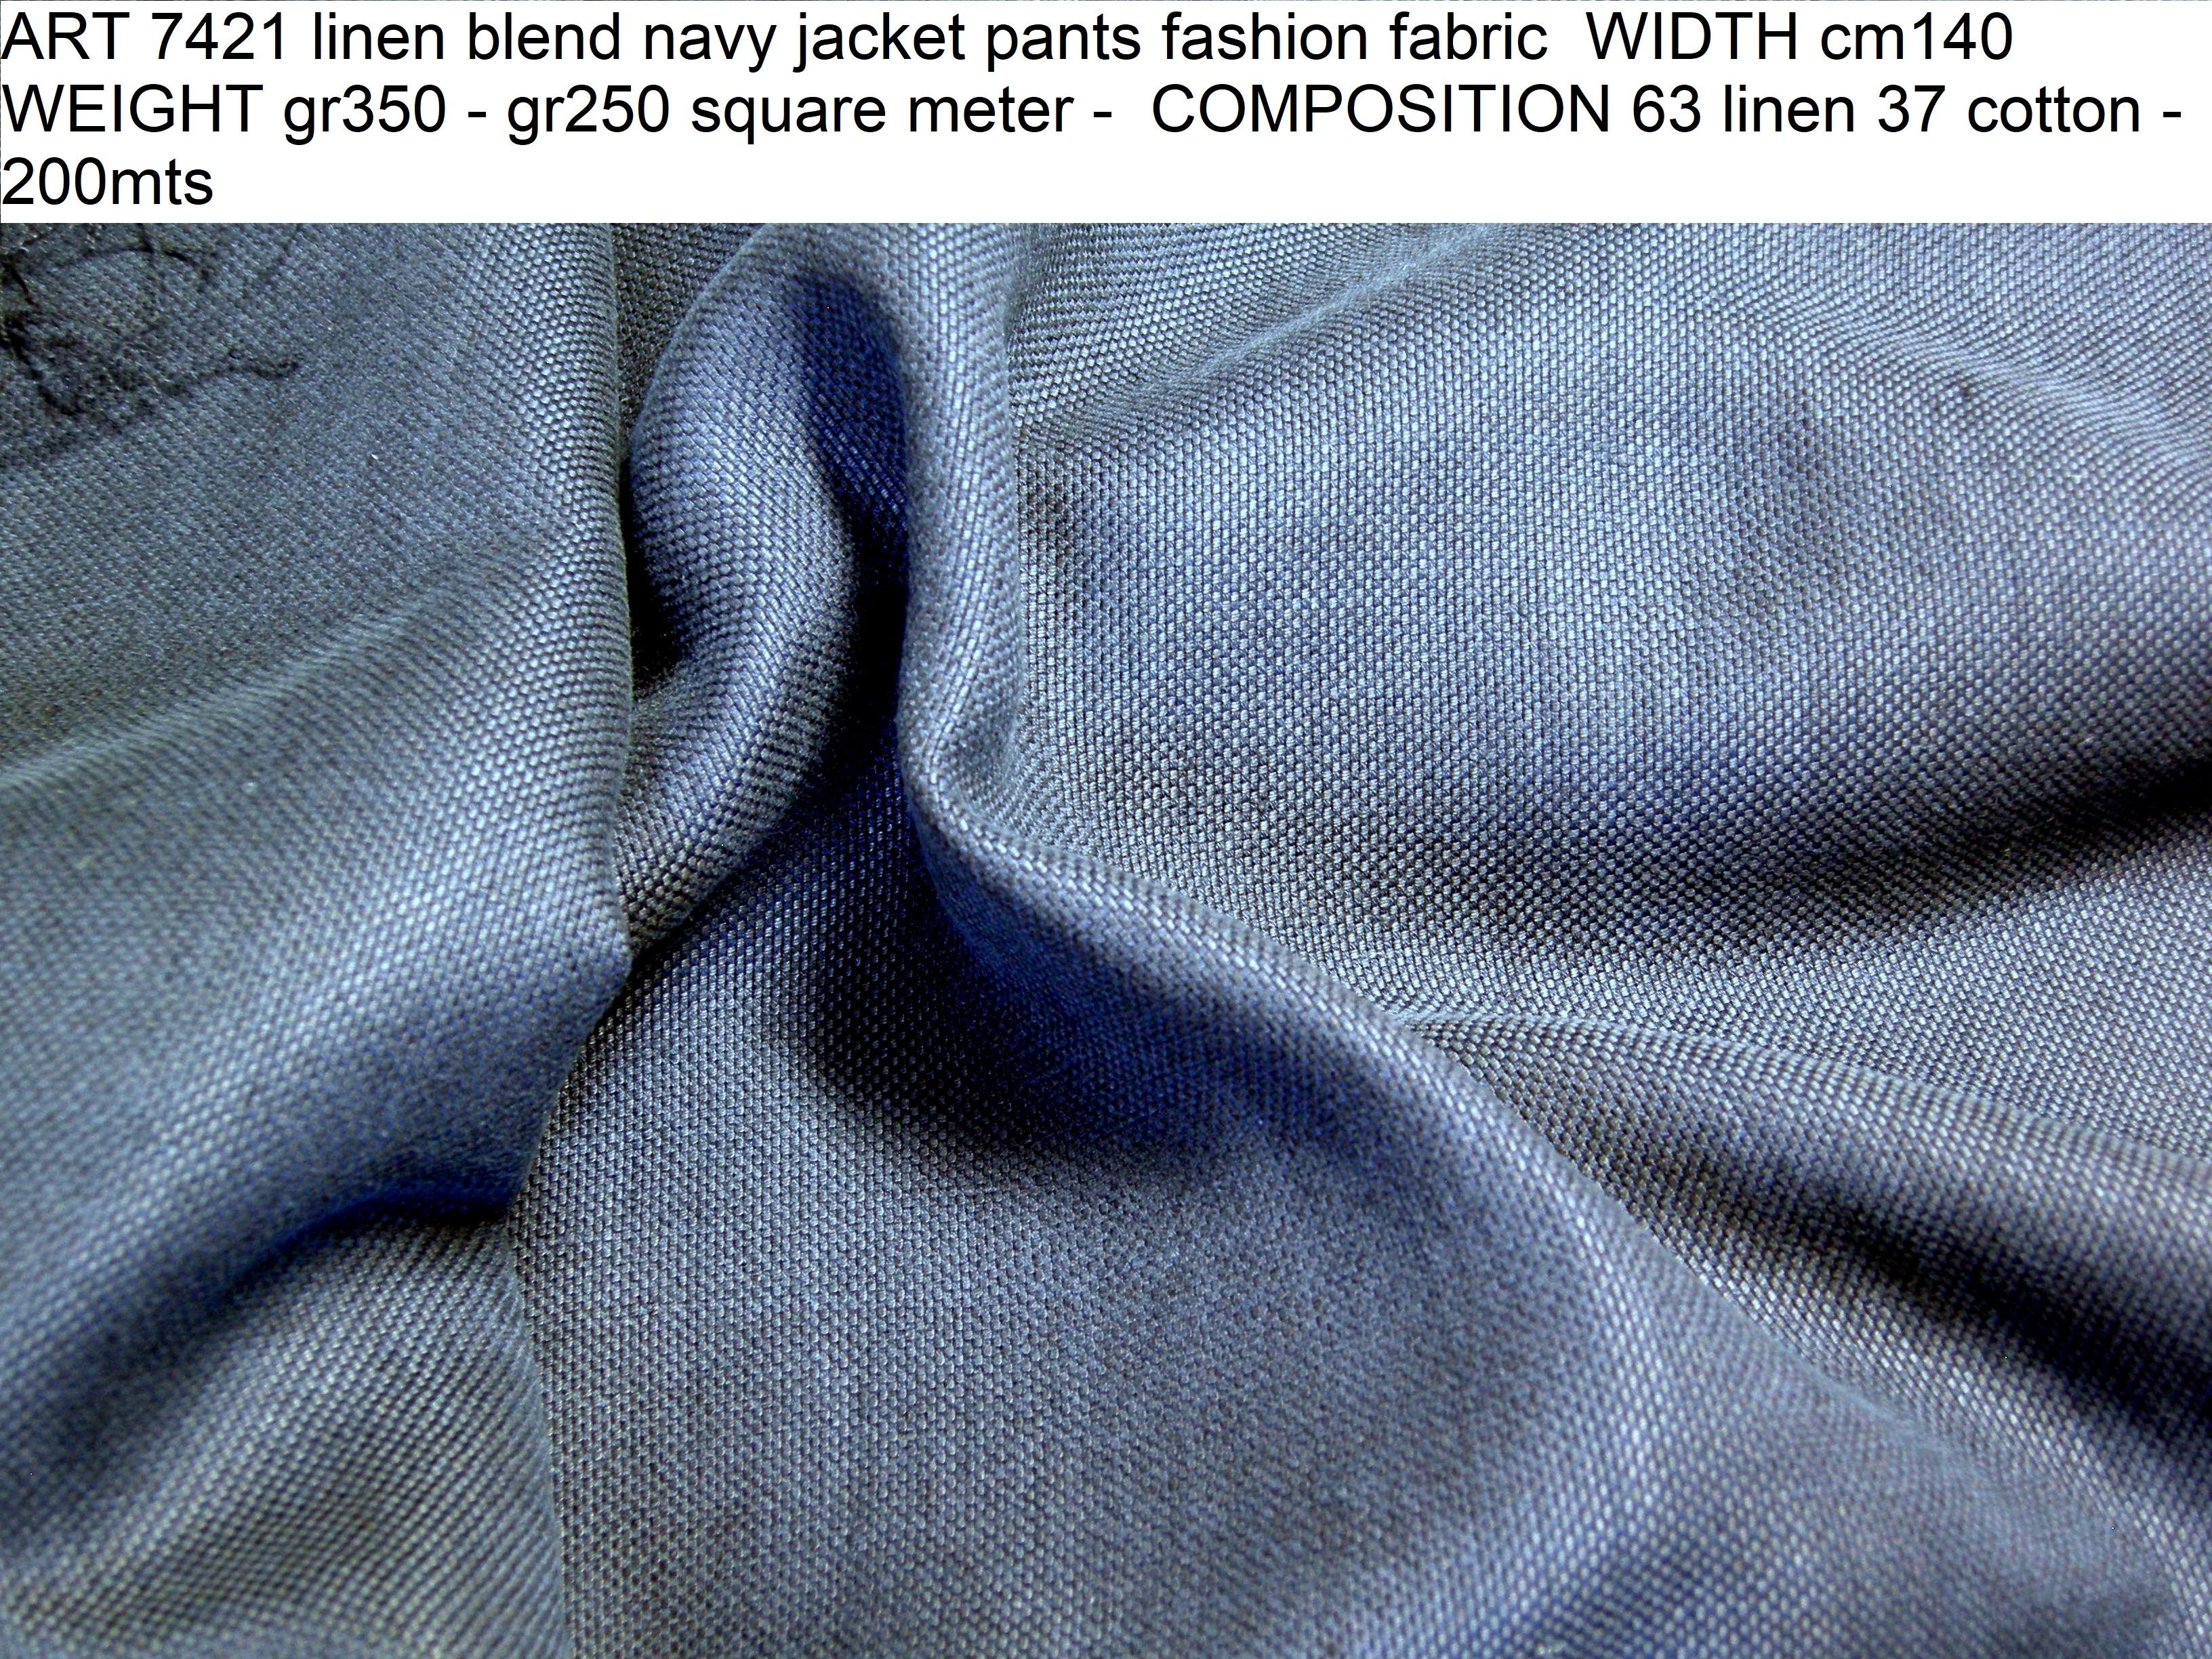 ART 7421 linen blend navy jacket pants fashion fabric WIDTH cm140 WEIGHT gr350 - gr250 square meter - COMPOSITION 63 linen 37 cotton - 200mts